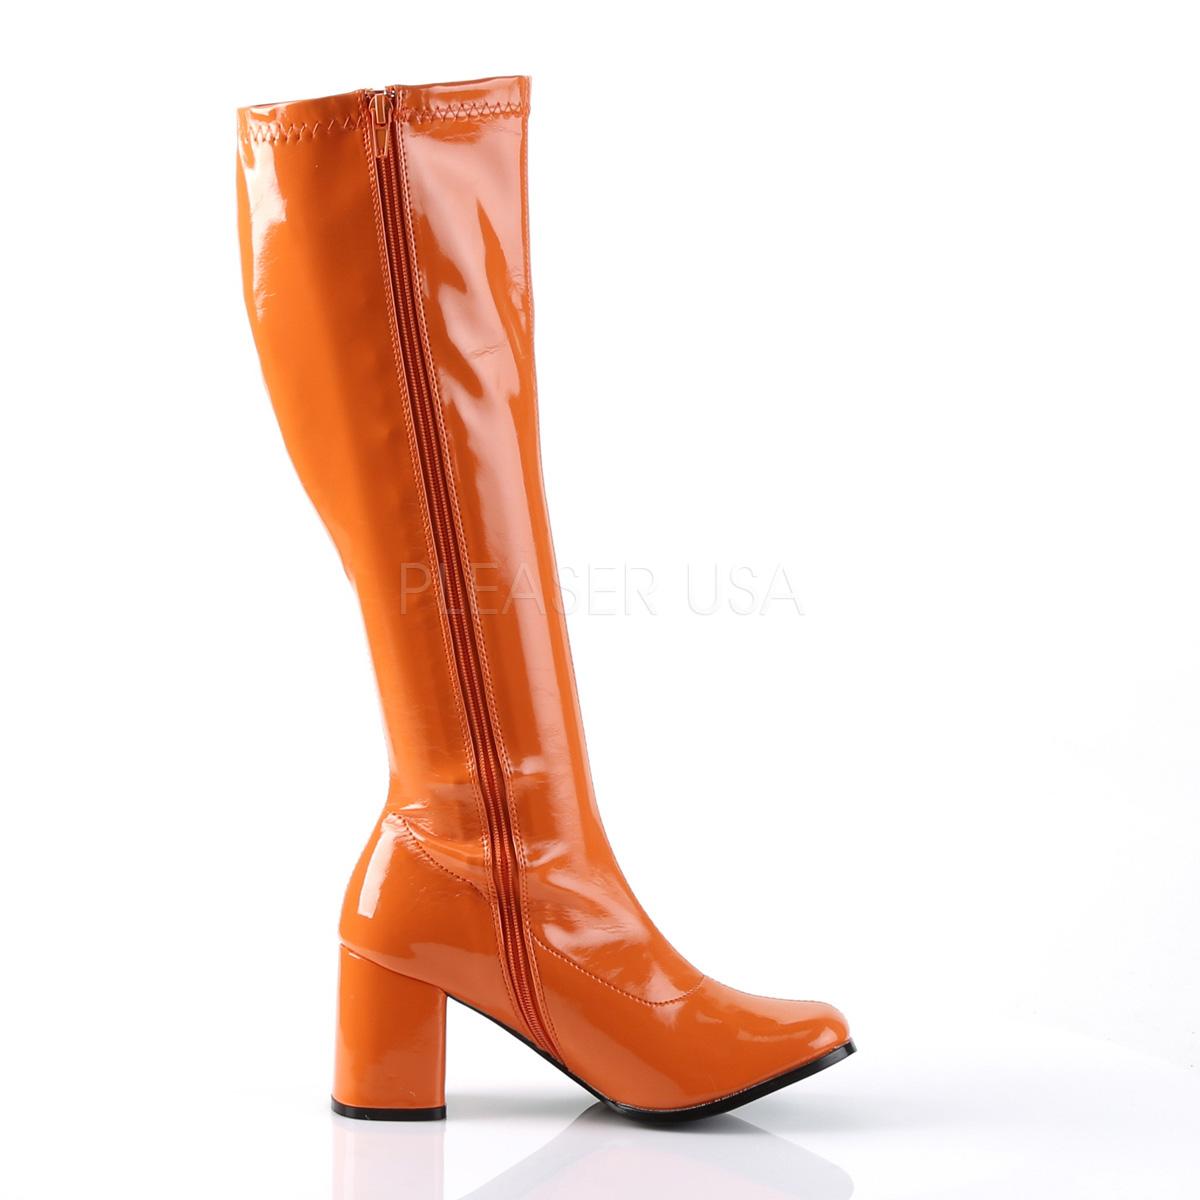 FUNTASMA(Pleaser) GOGO-300 オレンジ ニーハイブーツ GOGOブーツ コスプレ用ブーツ イベント 衣装 仮装 ハロウィン◆取り寄せ